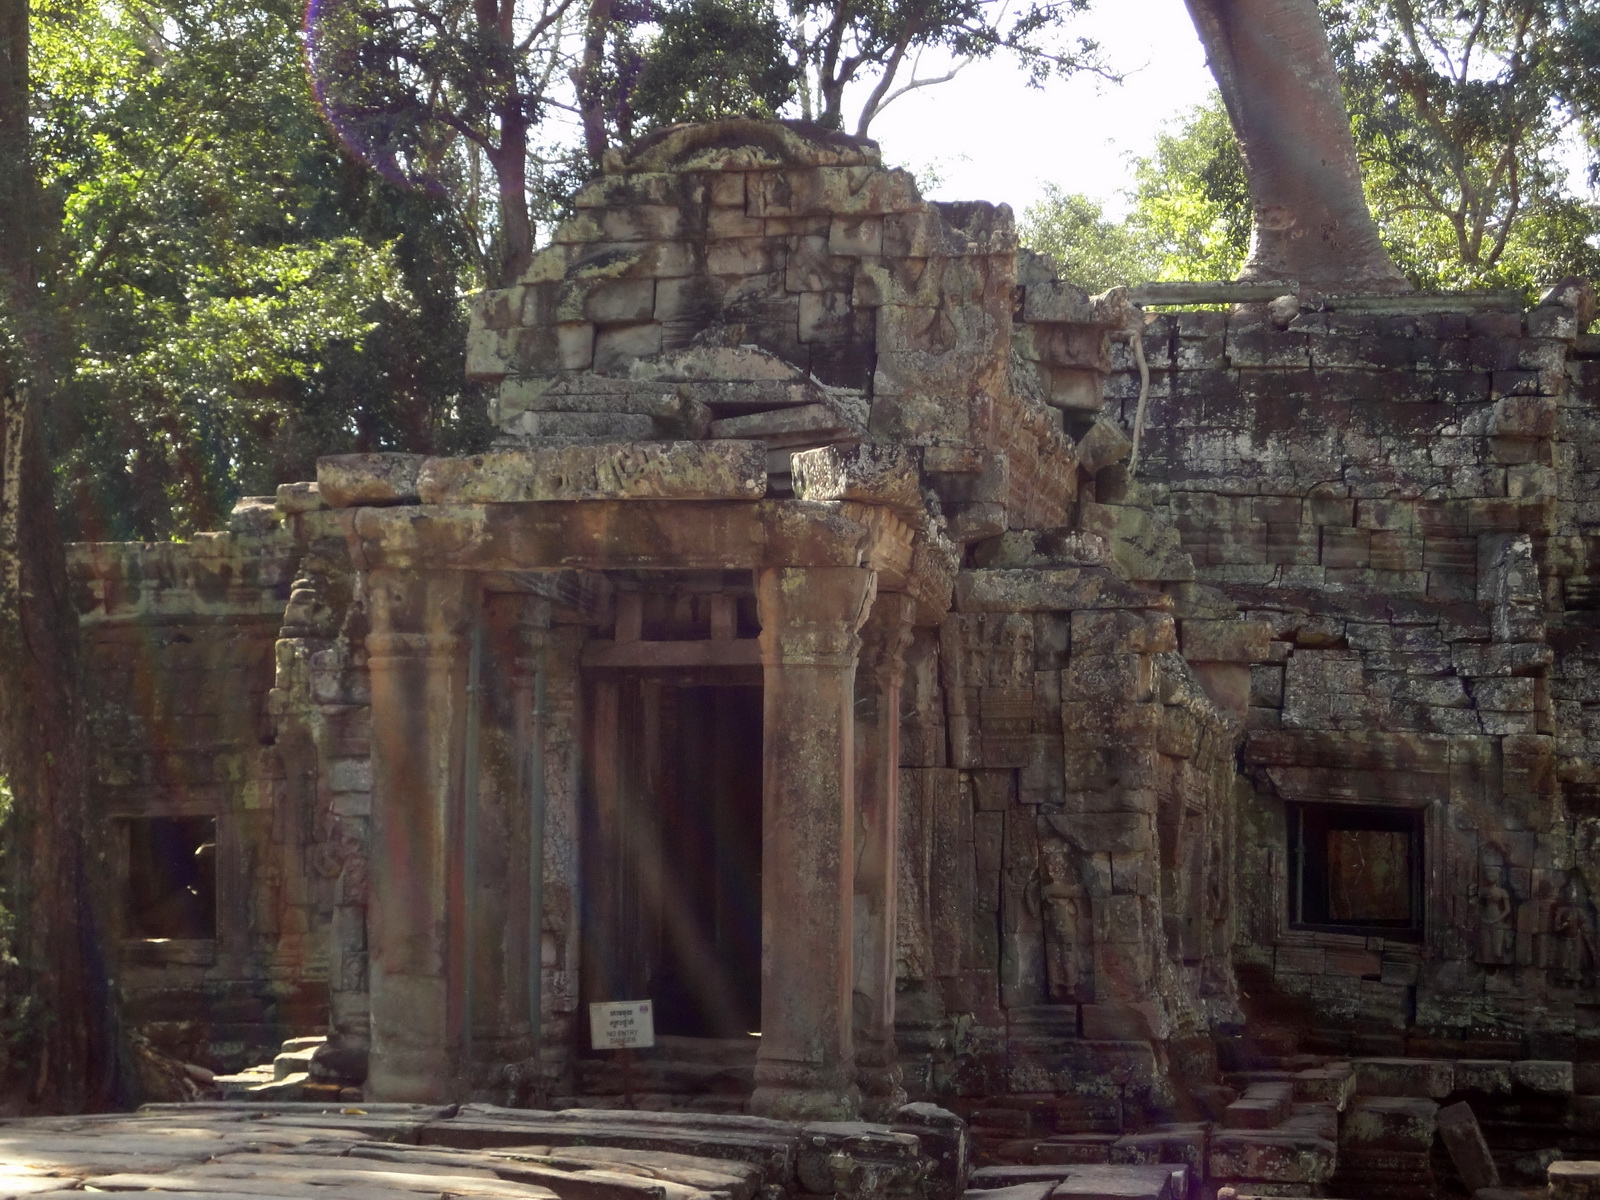 Ta Prohm Tomb Raider Bayon architecture Gopura 4 East entrance 02